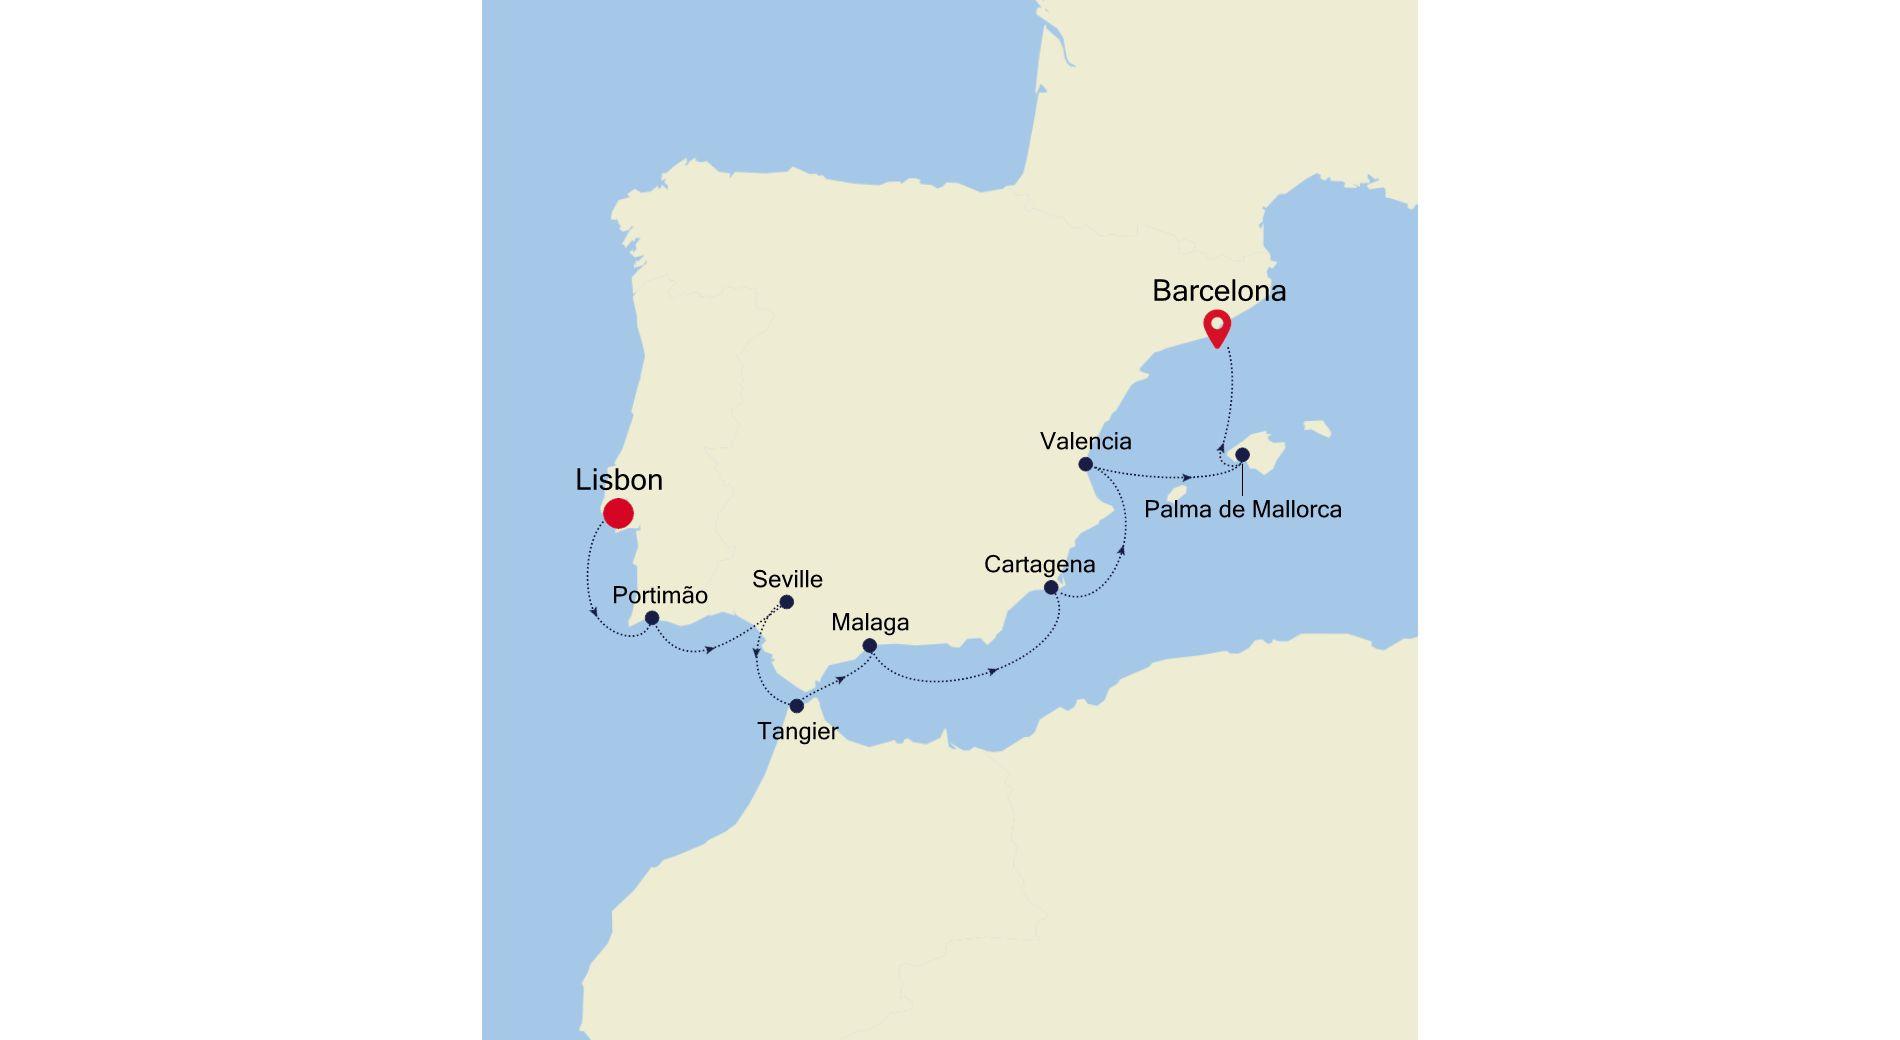 SS200913011 - Lisbon a Barcelona